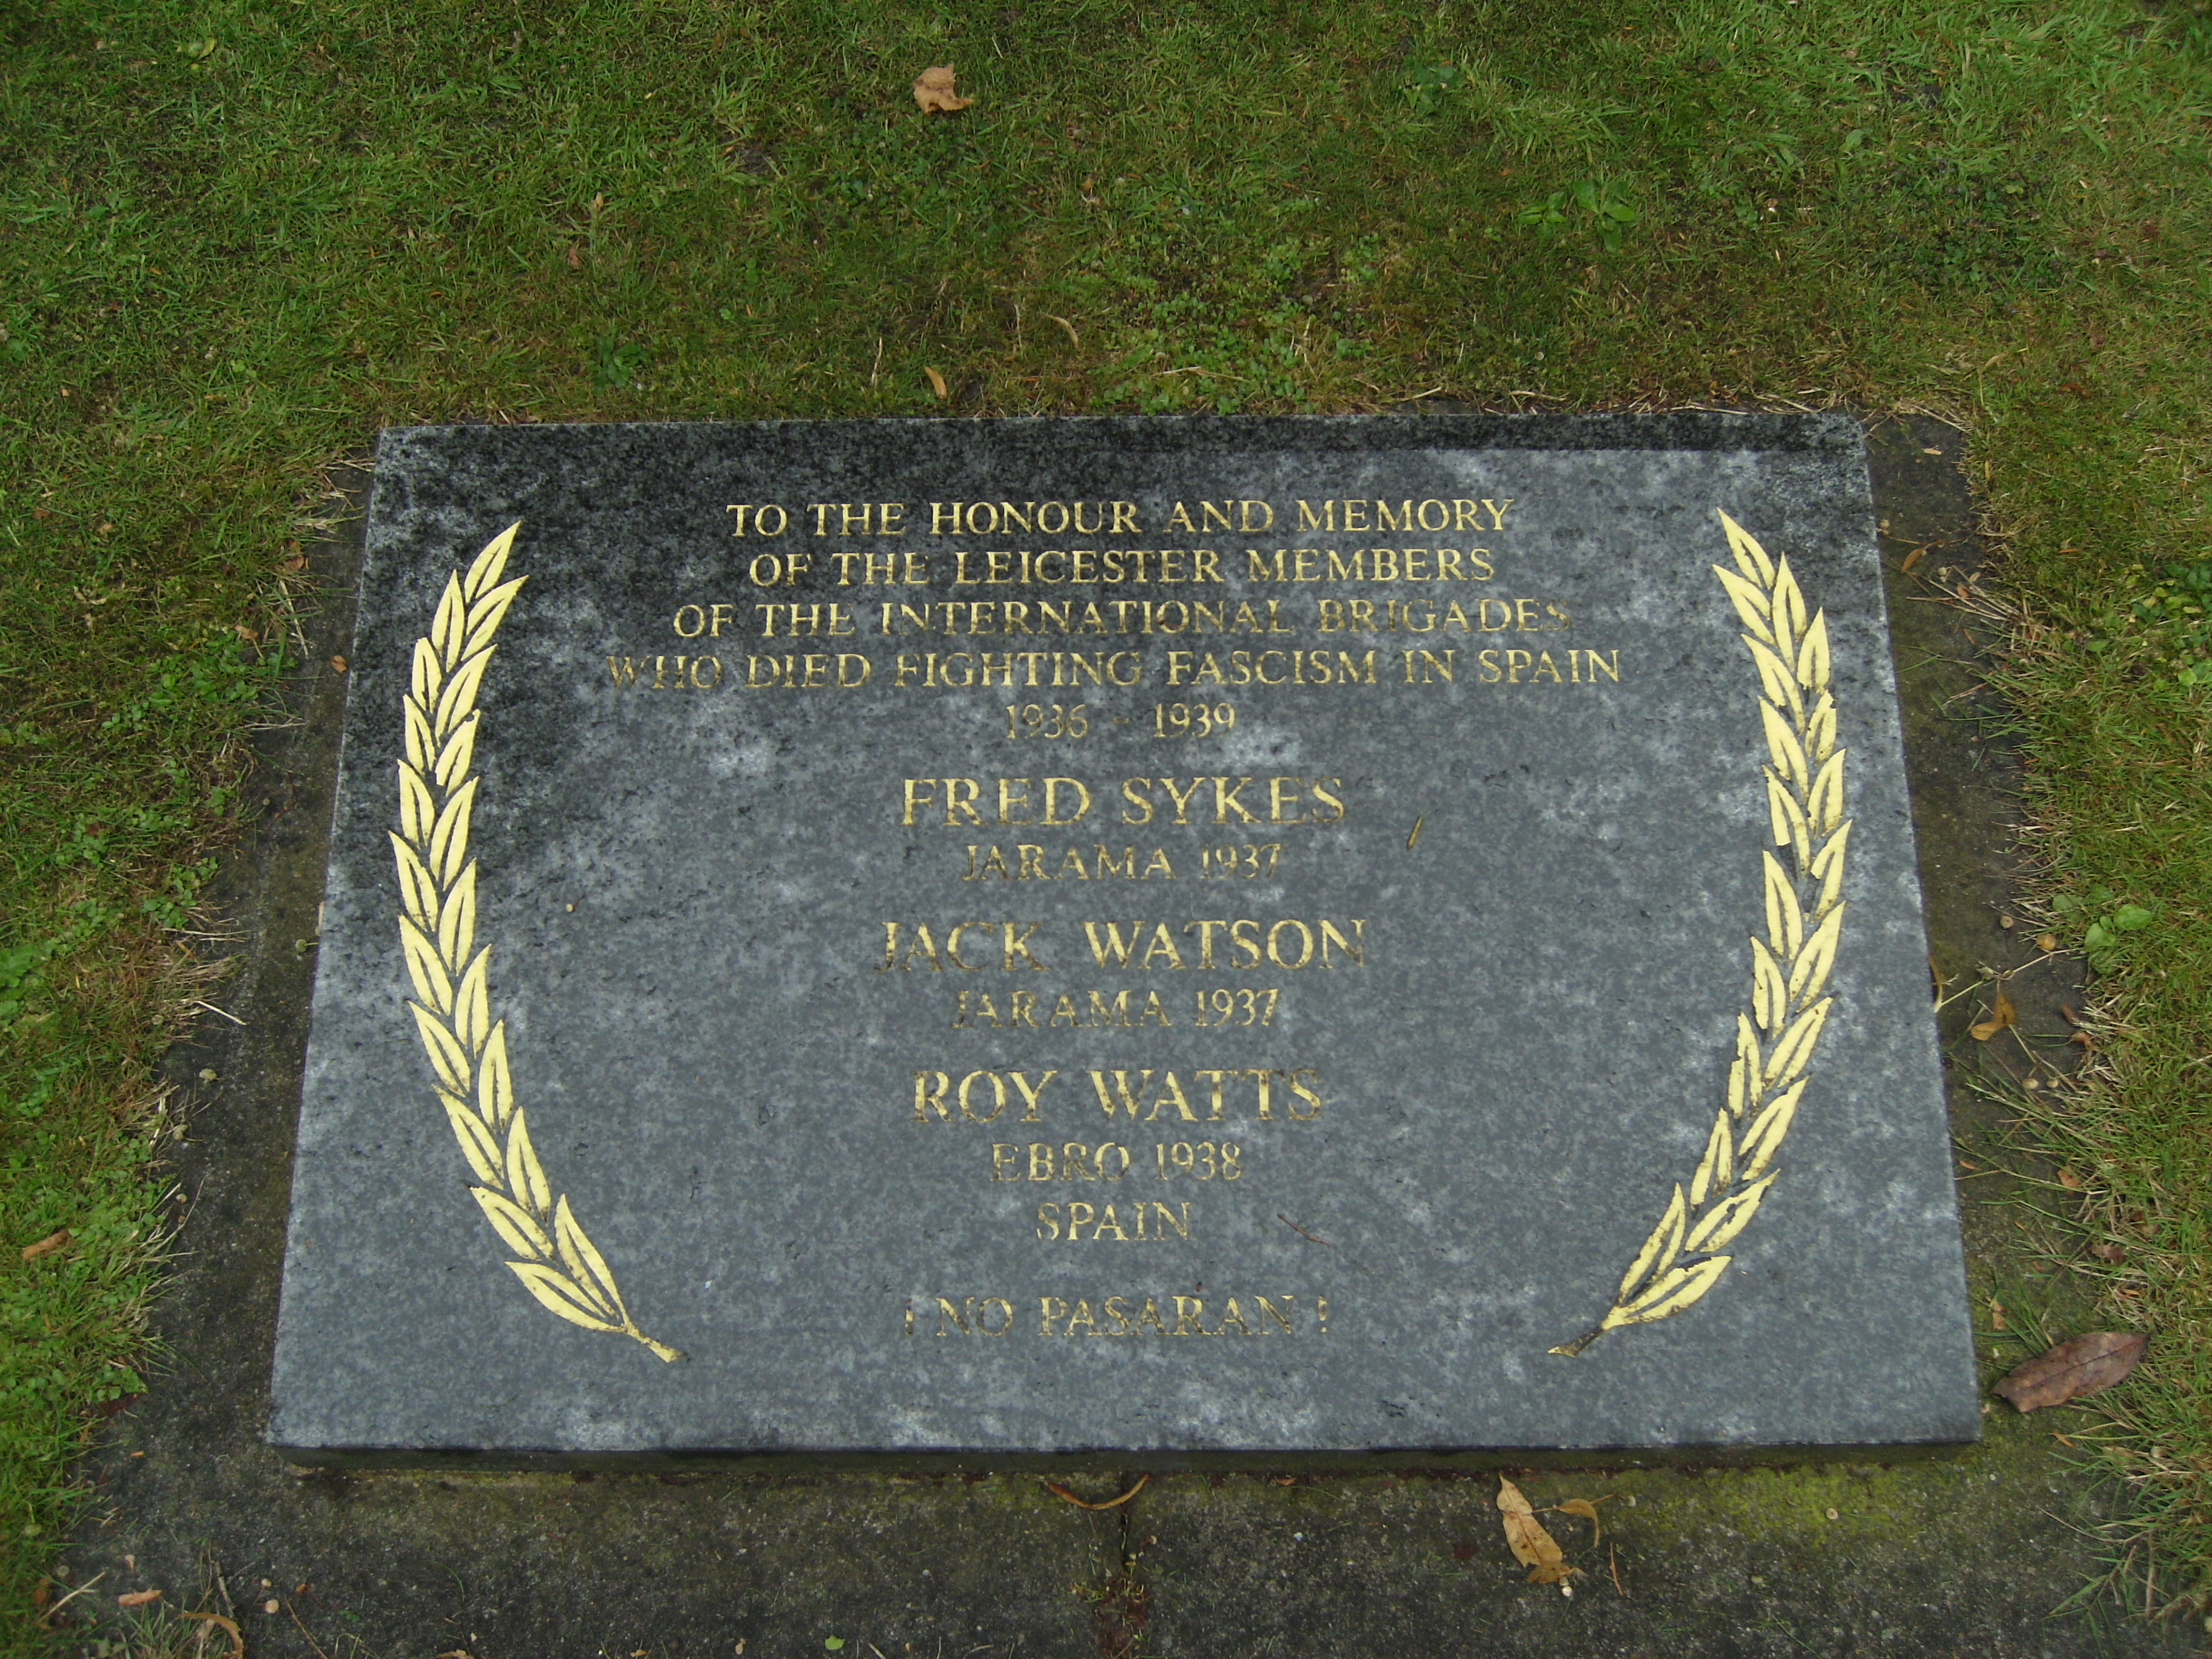 Leicester International Brigade memorial